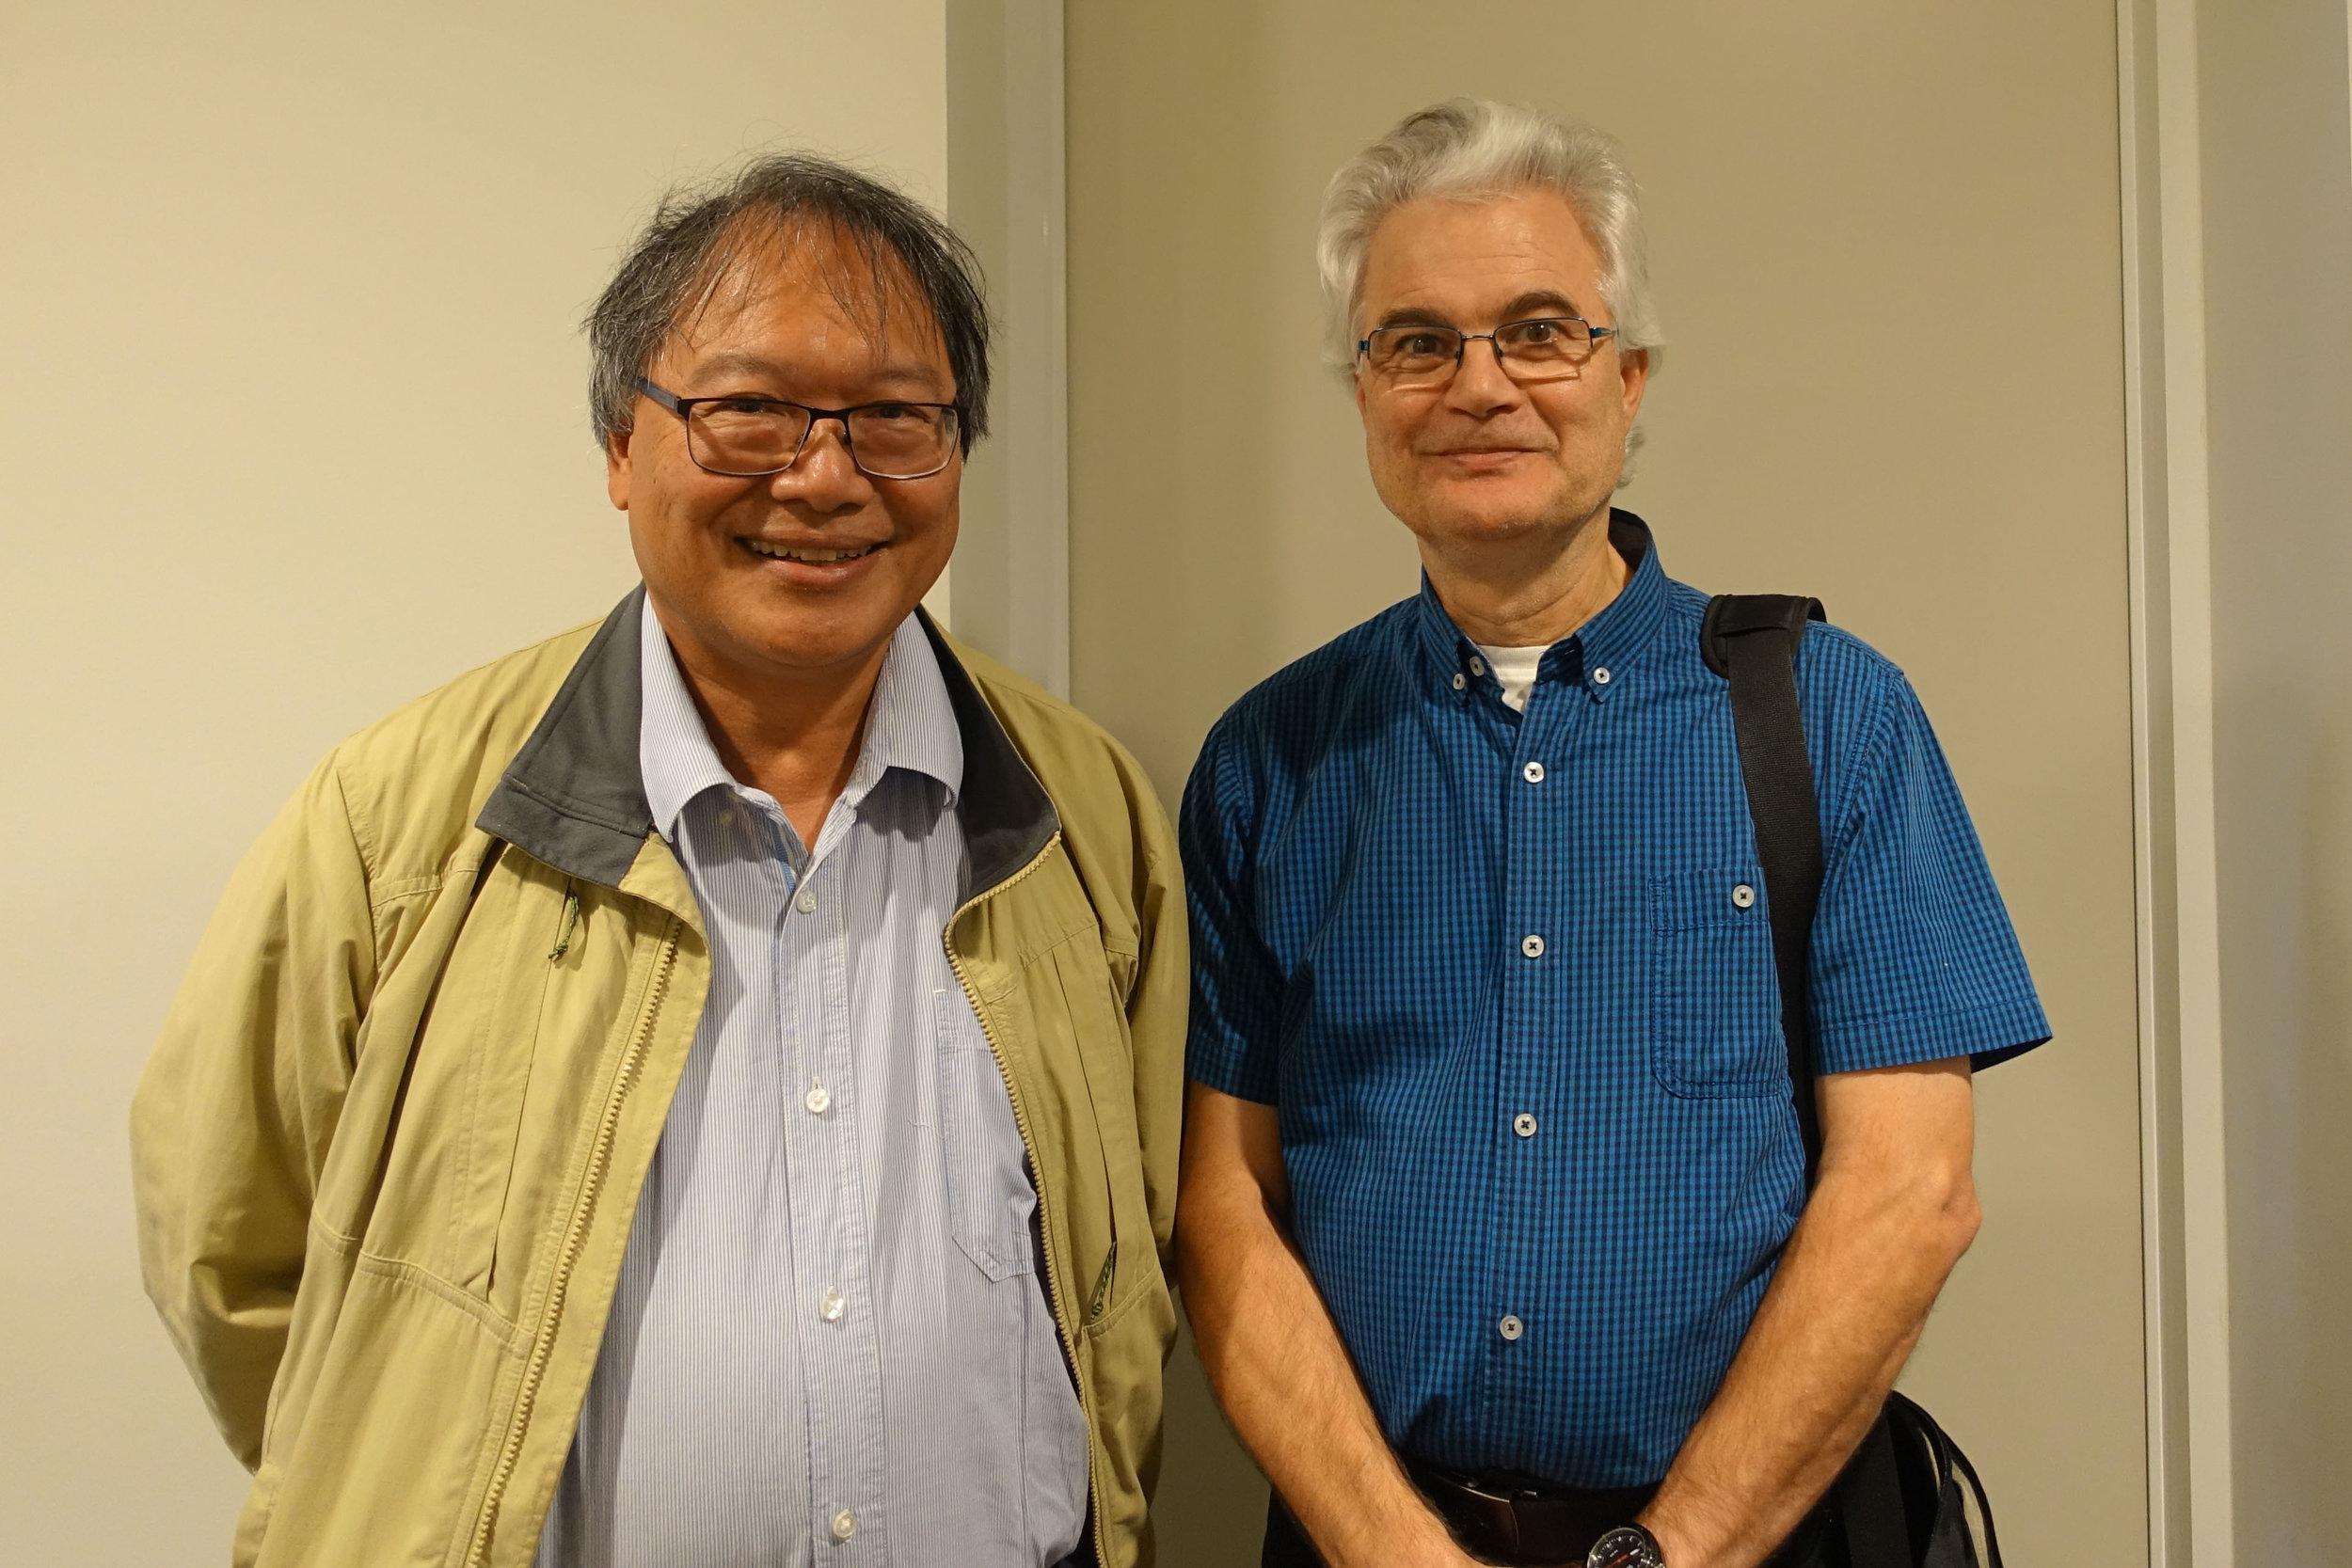 Augustine Ignatius Doronila and Freddy